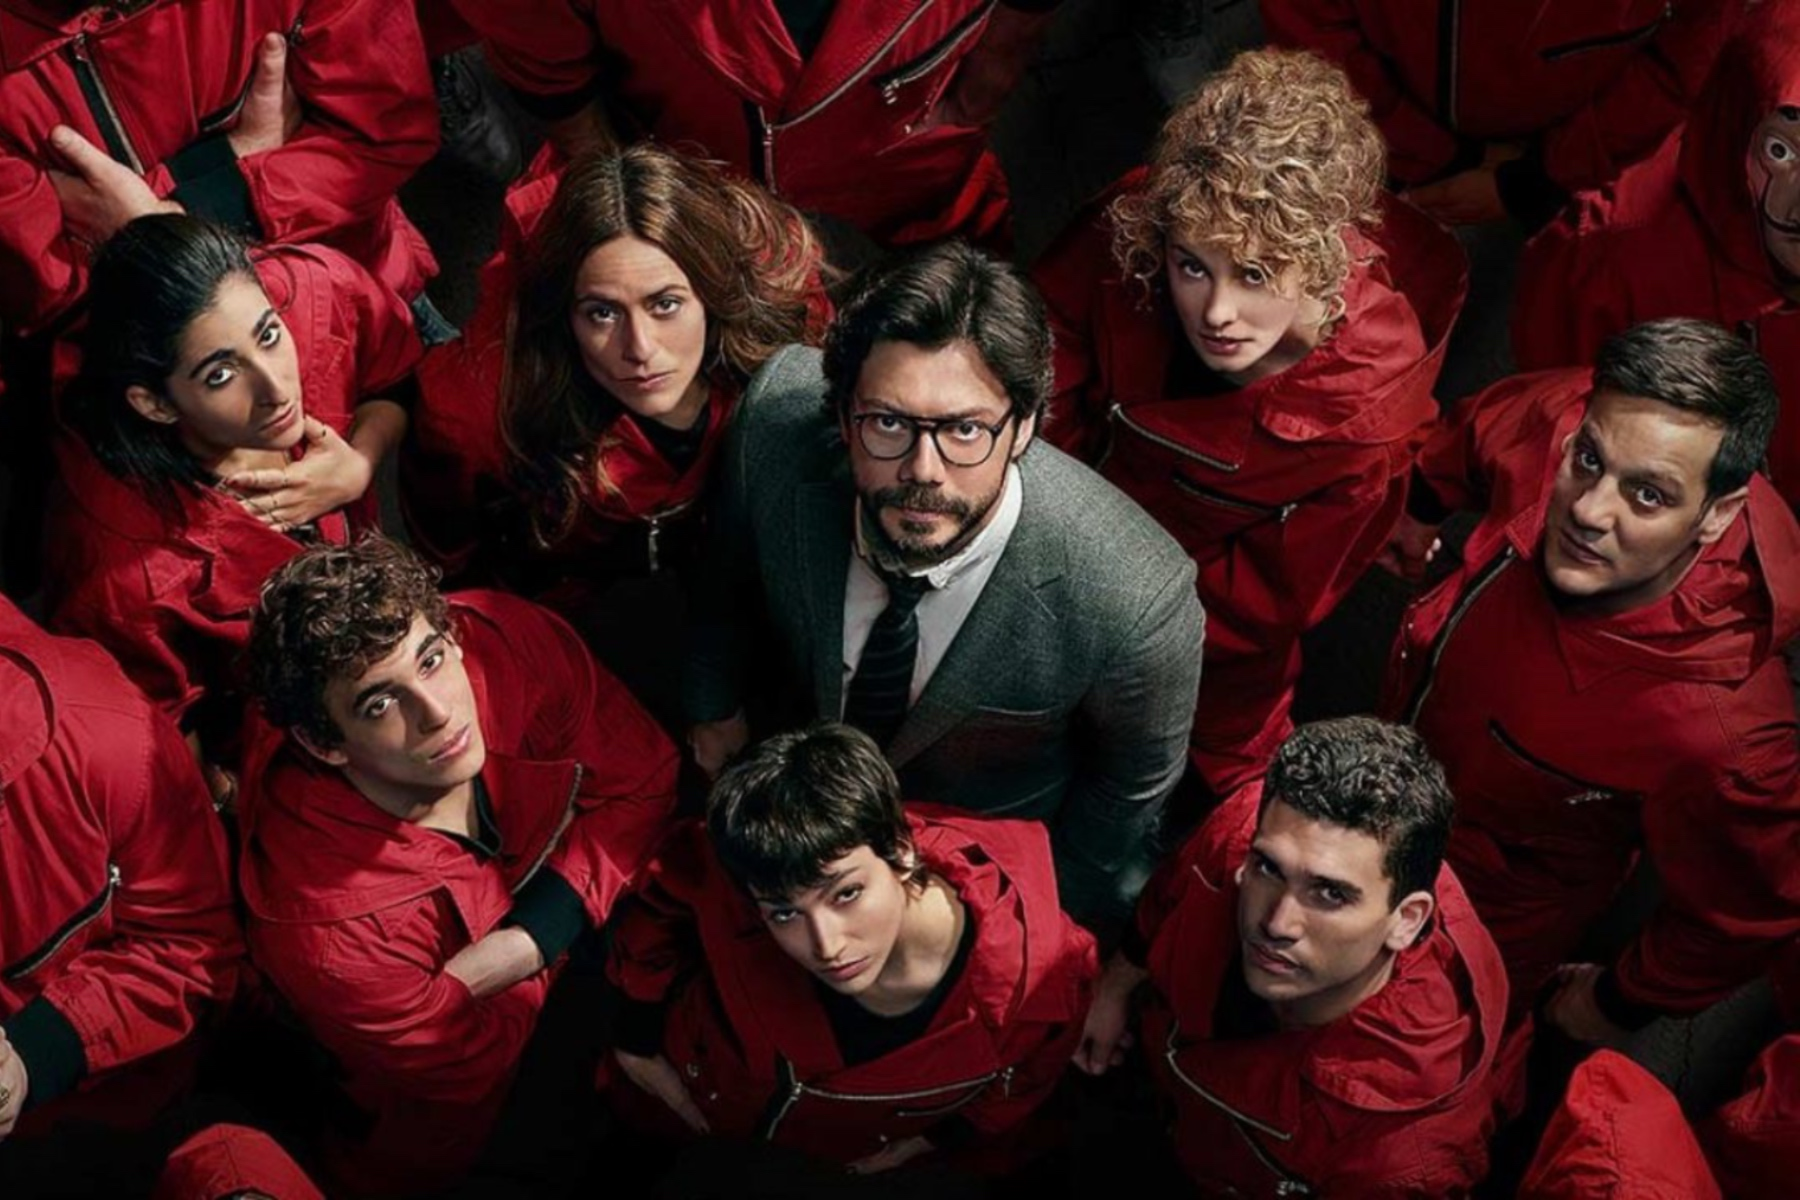 Geheimtipp Augsburg Serien September Empfehlungen Tipps Hausdesgeldes Netflix – ©Netflix